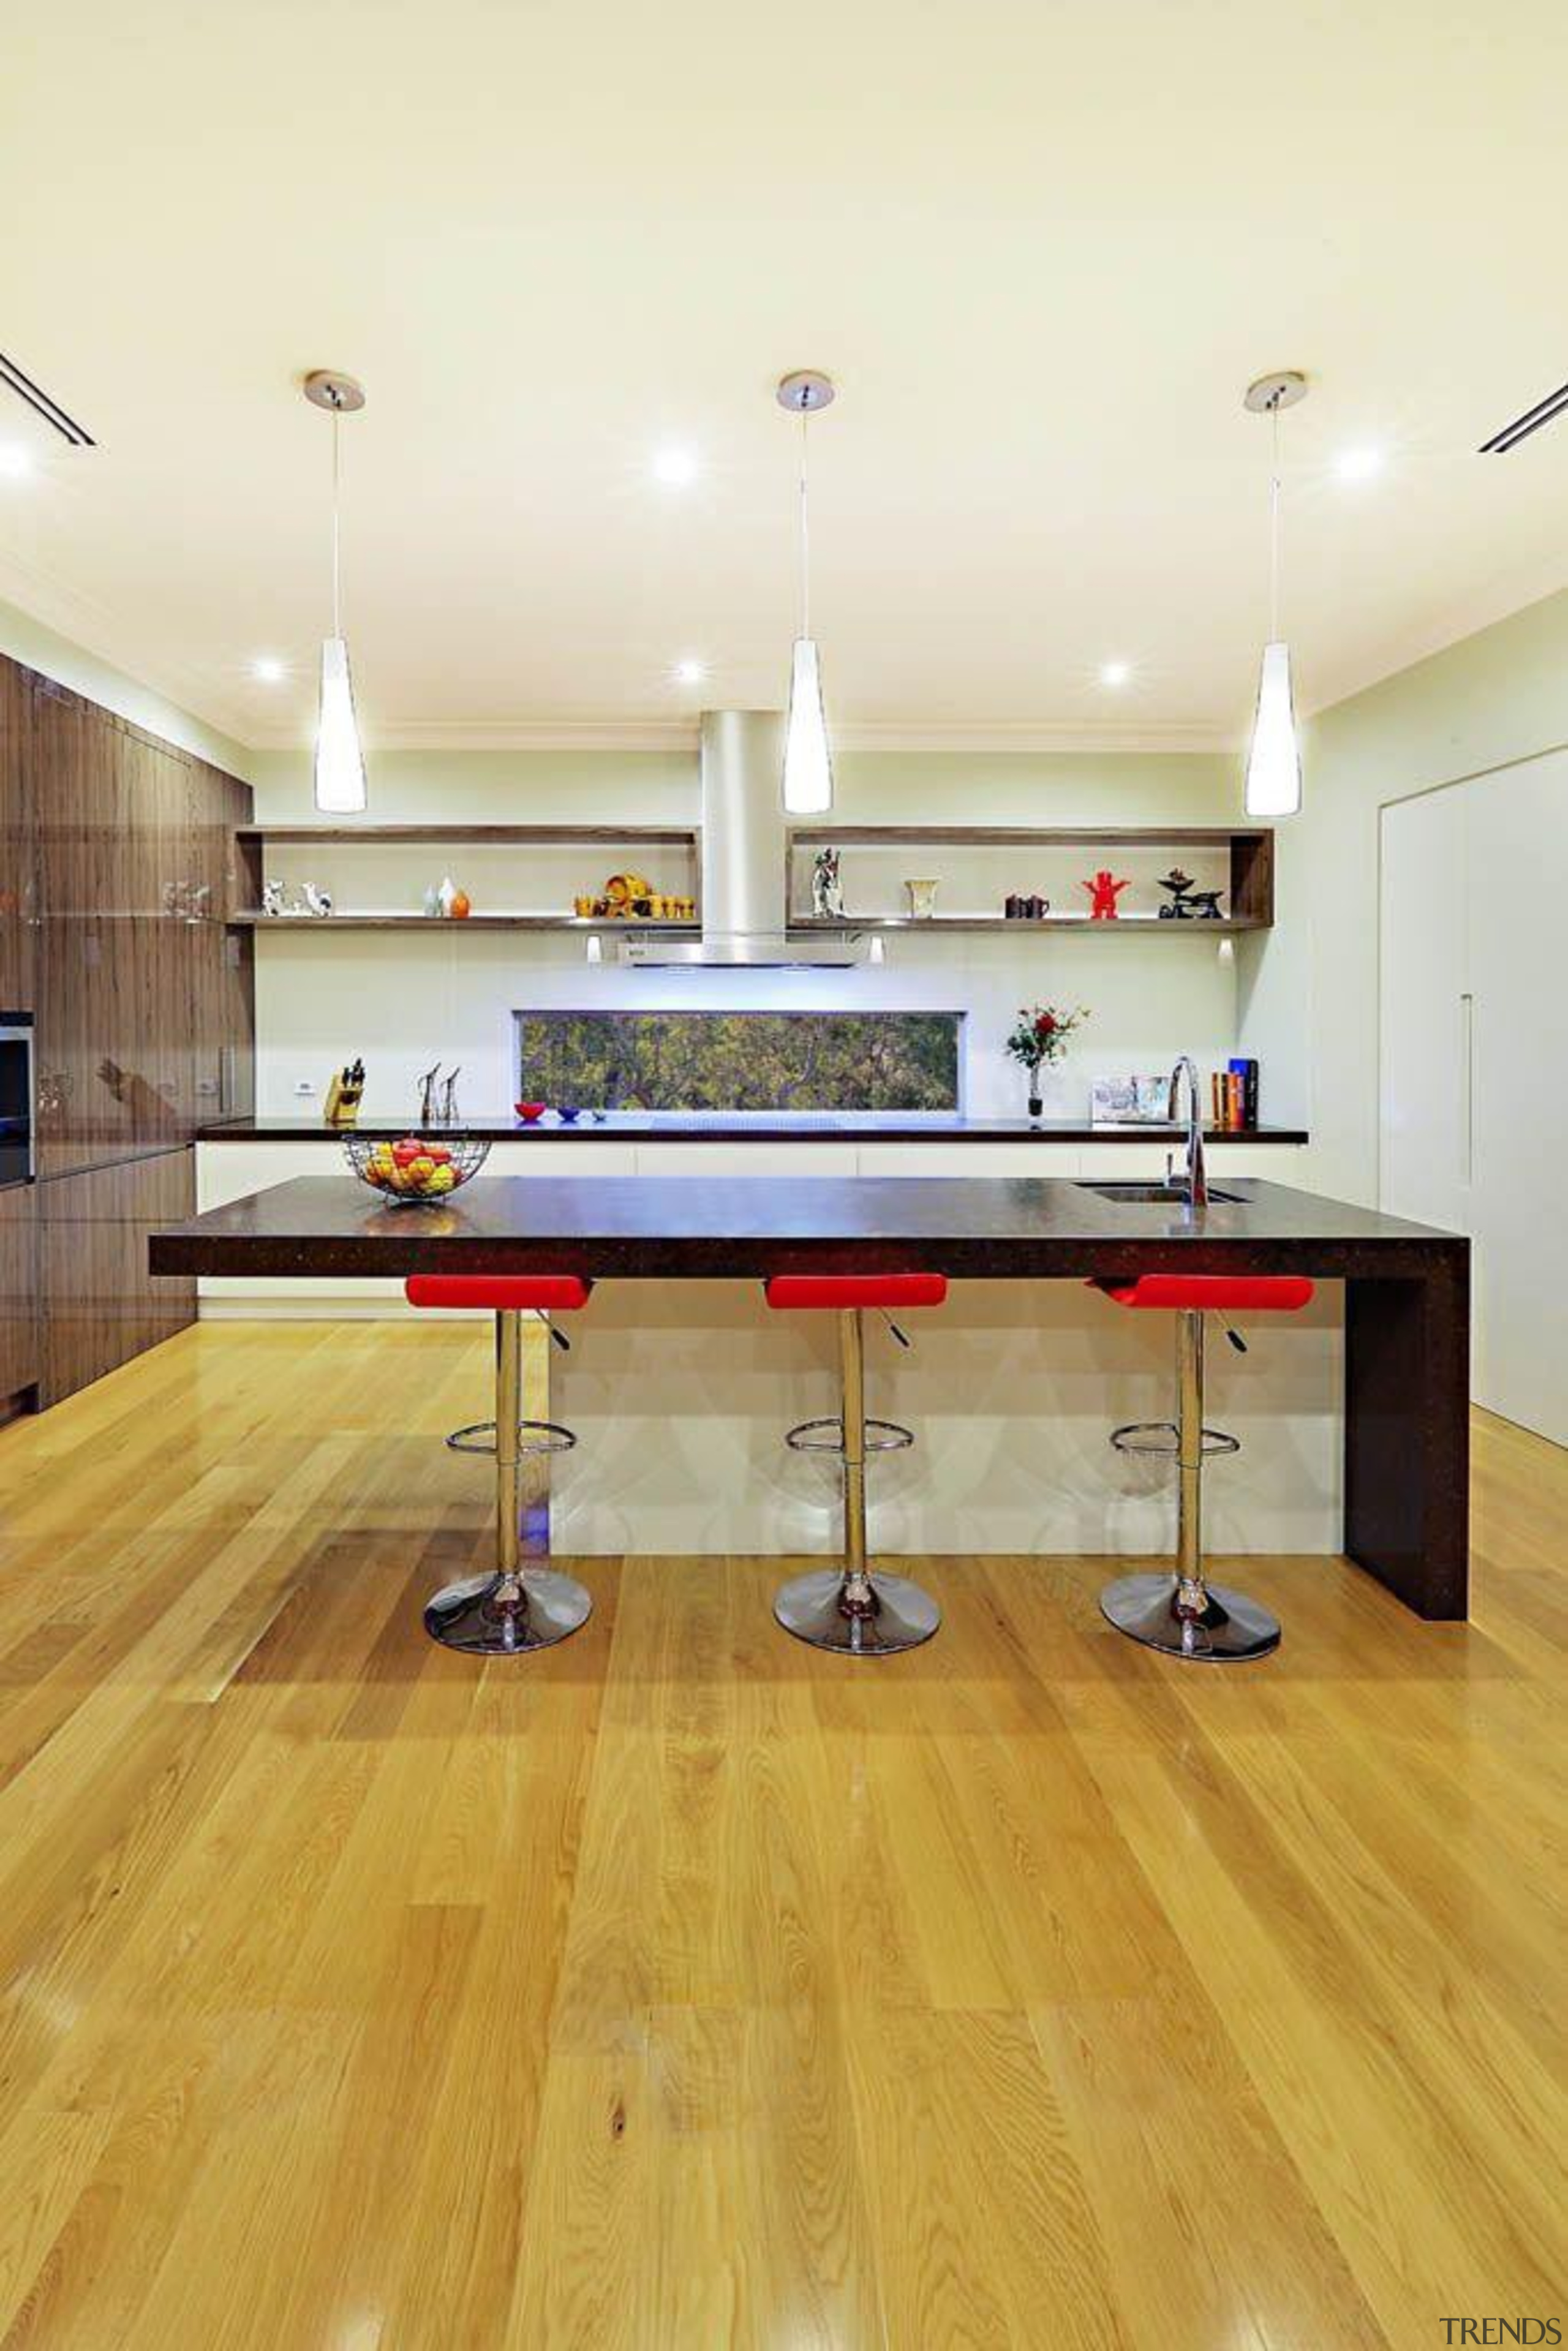 Impala Kitchens Cocoa Fudge - Cocoa Fudge™ - floor, flooring, furniture, hardwood, interior design, laminate flooring, recreation room, room, table, wood, wood flooring, white, orange